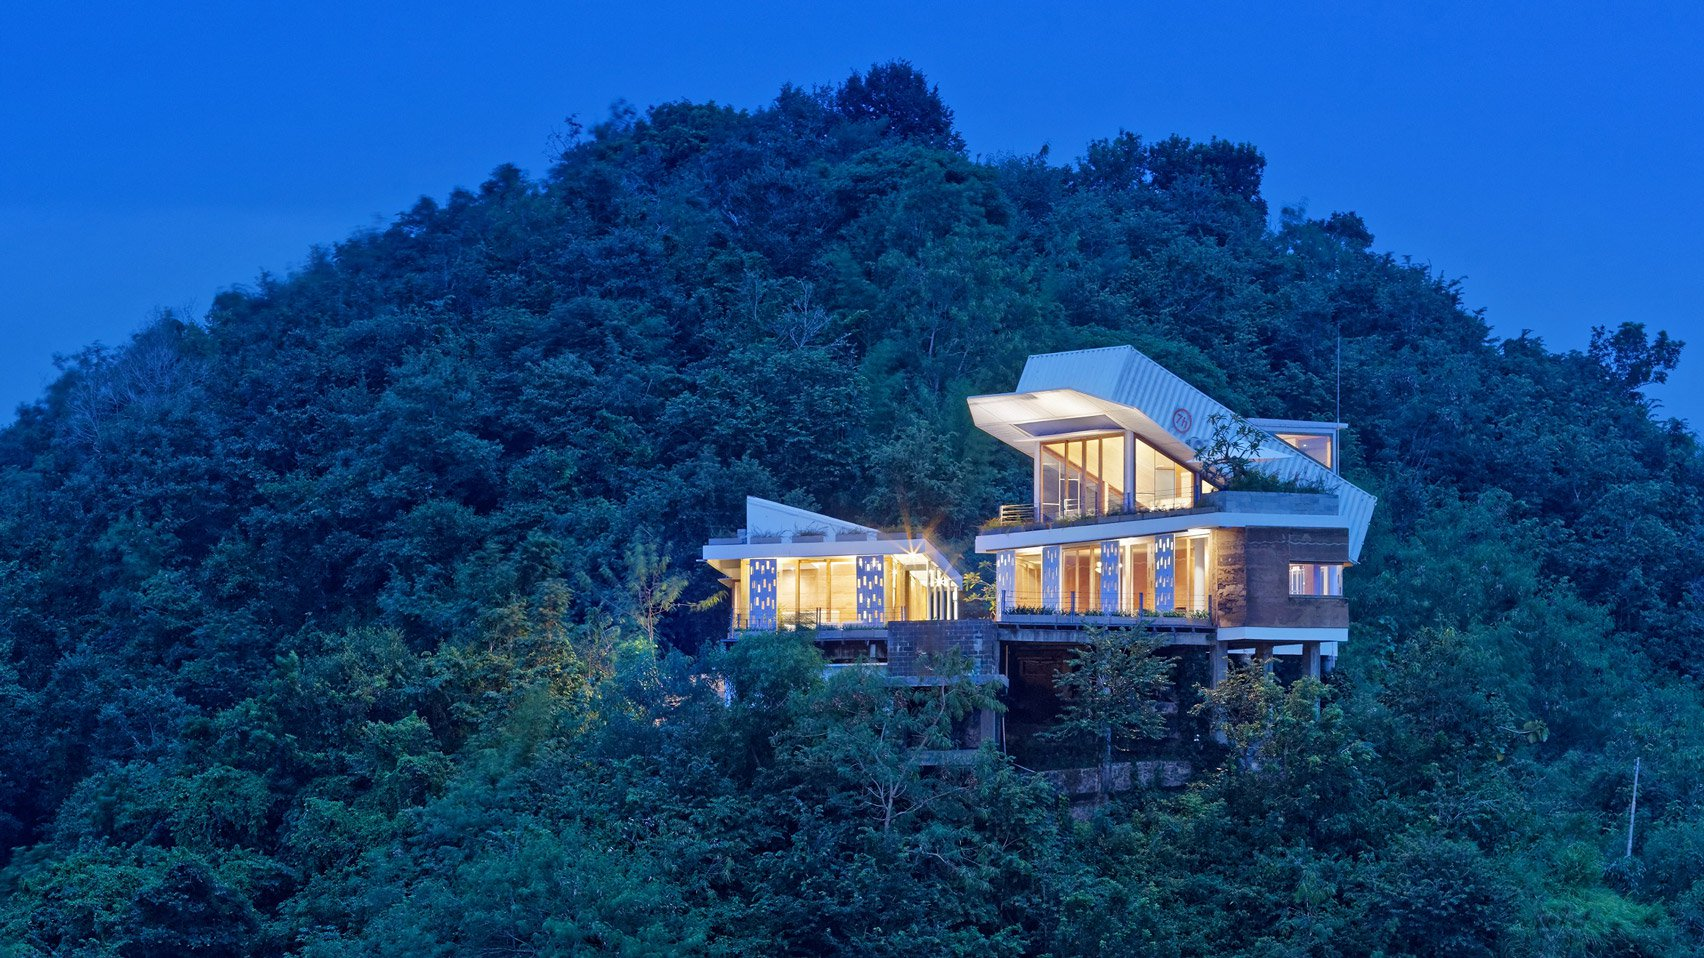 clay-house-budi-pradono-architects-architecture_dezeen_hero-1-1704x958.jpg